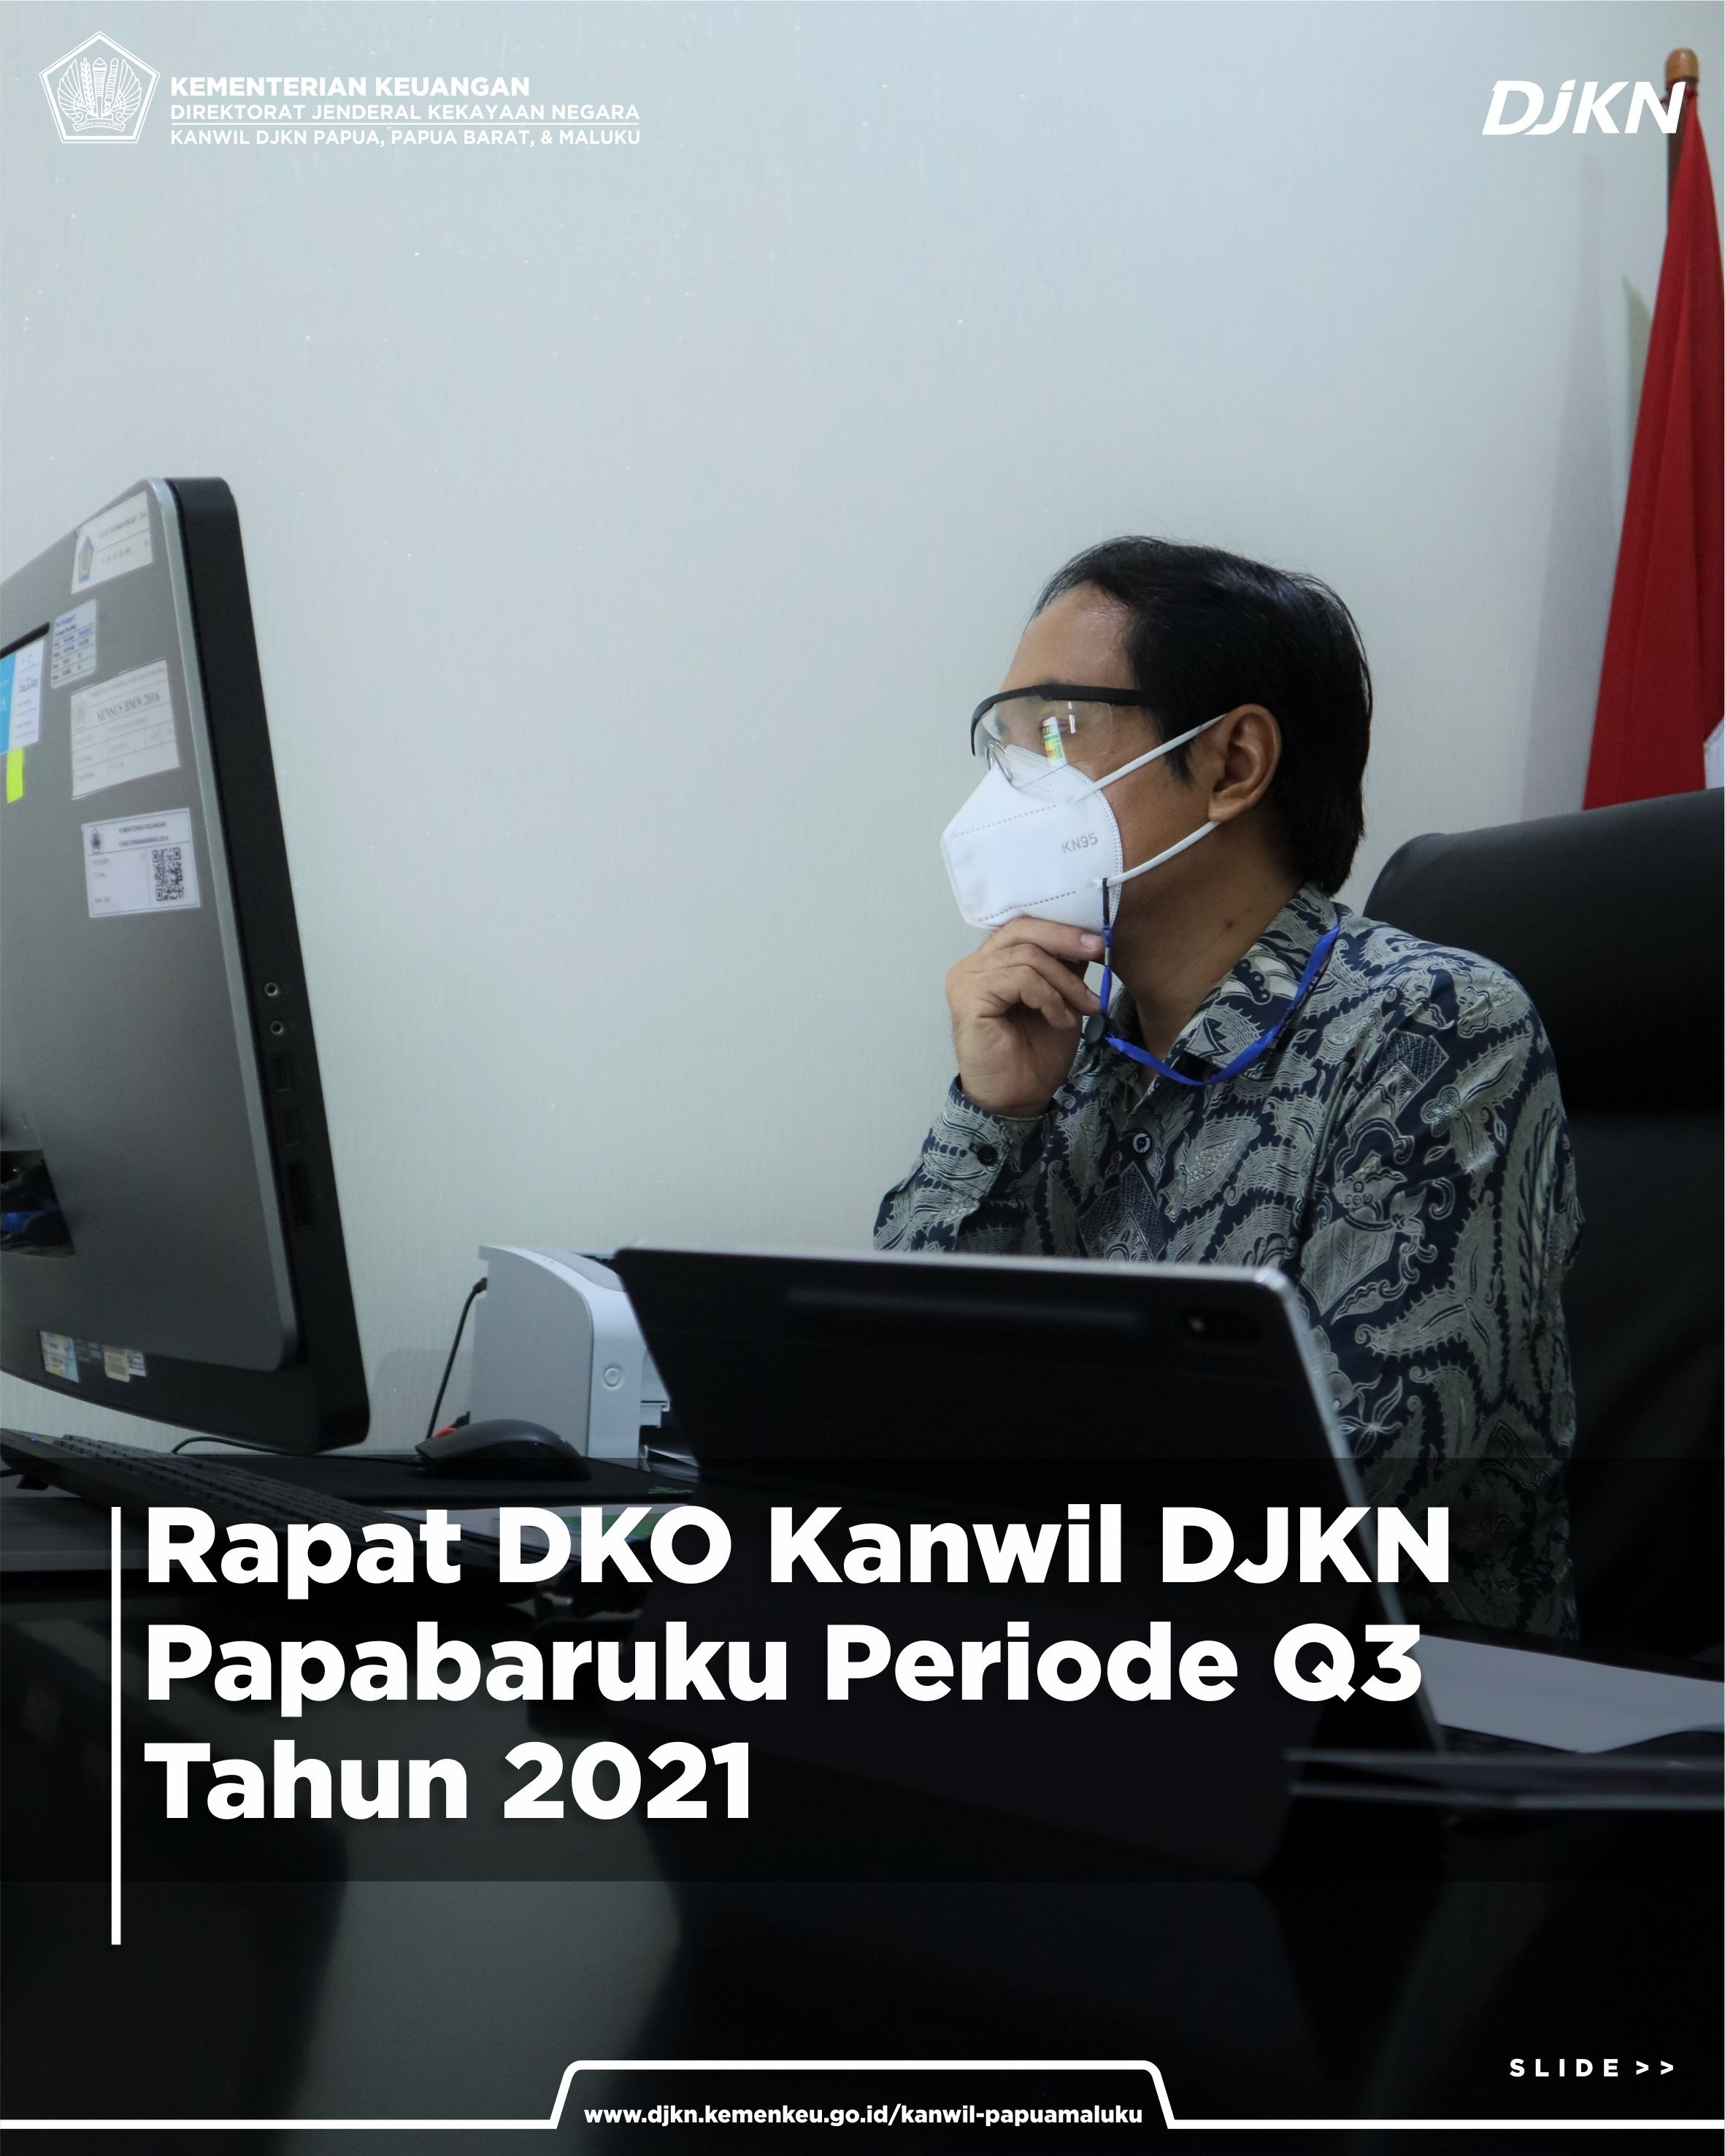 Rapat Dialog Kinerja Organisasi Lingkup Kanwil DJKN Papabaruku Periode Triwulan III Tahun 2021